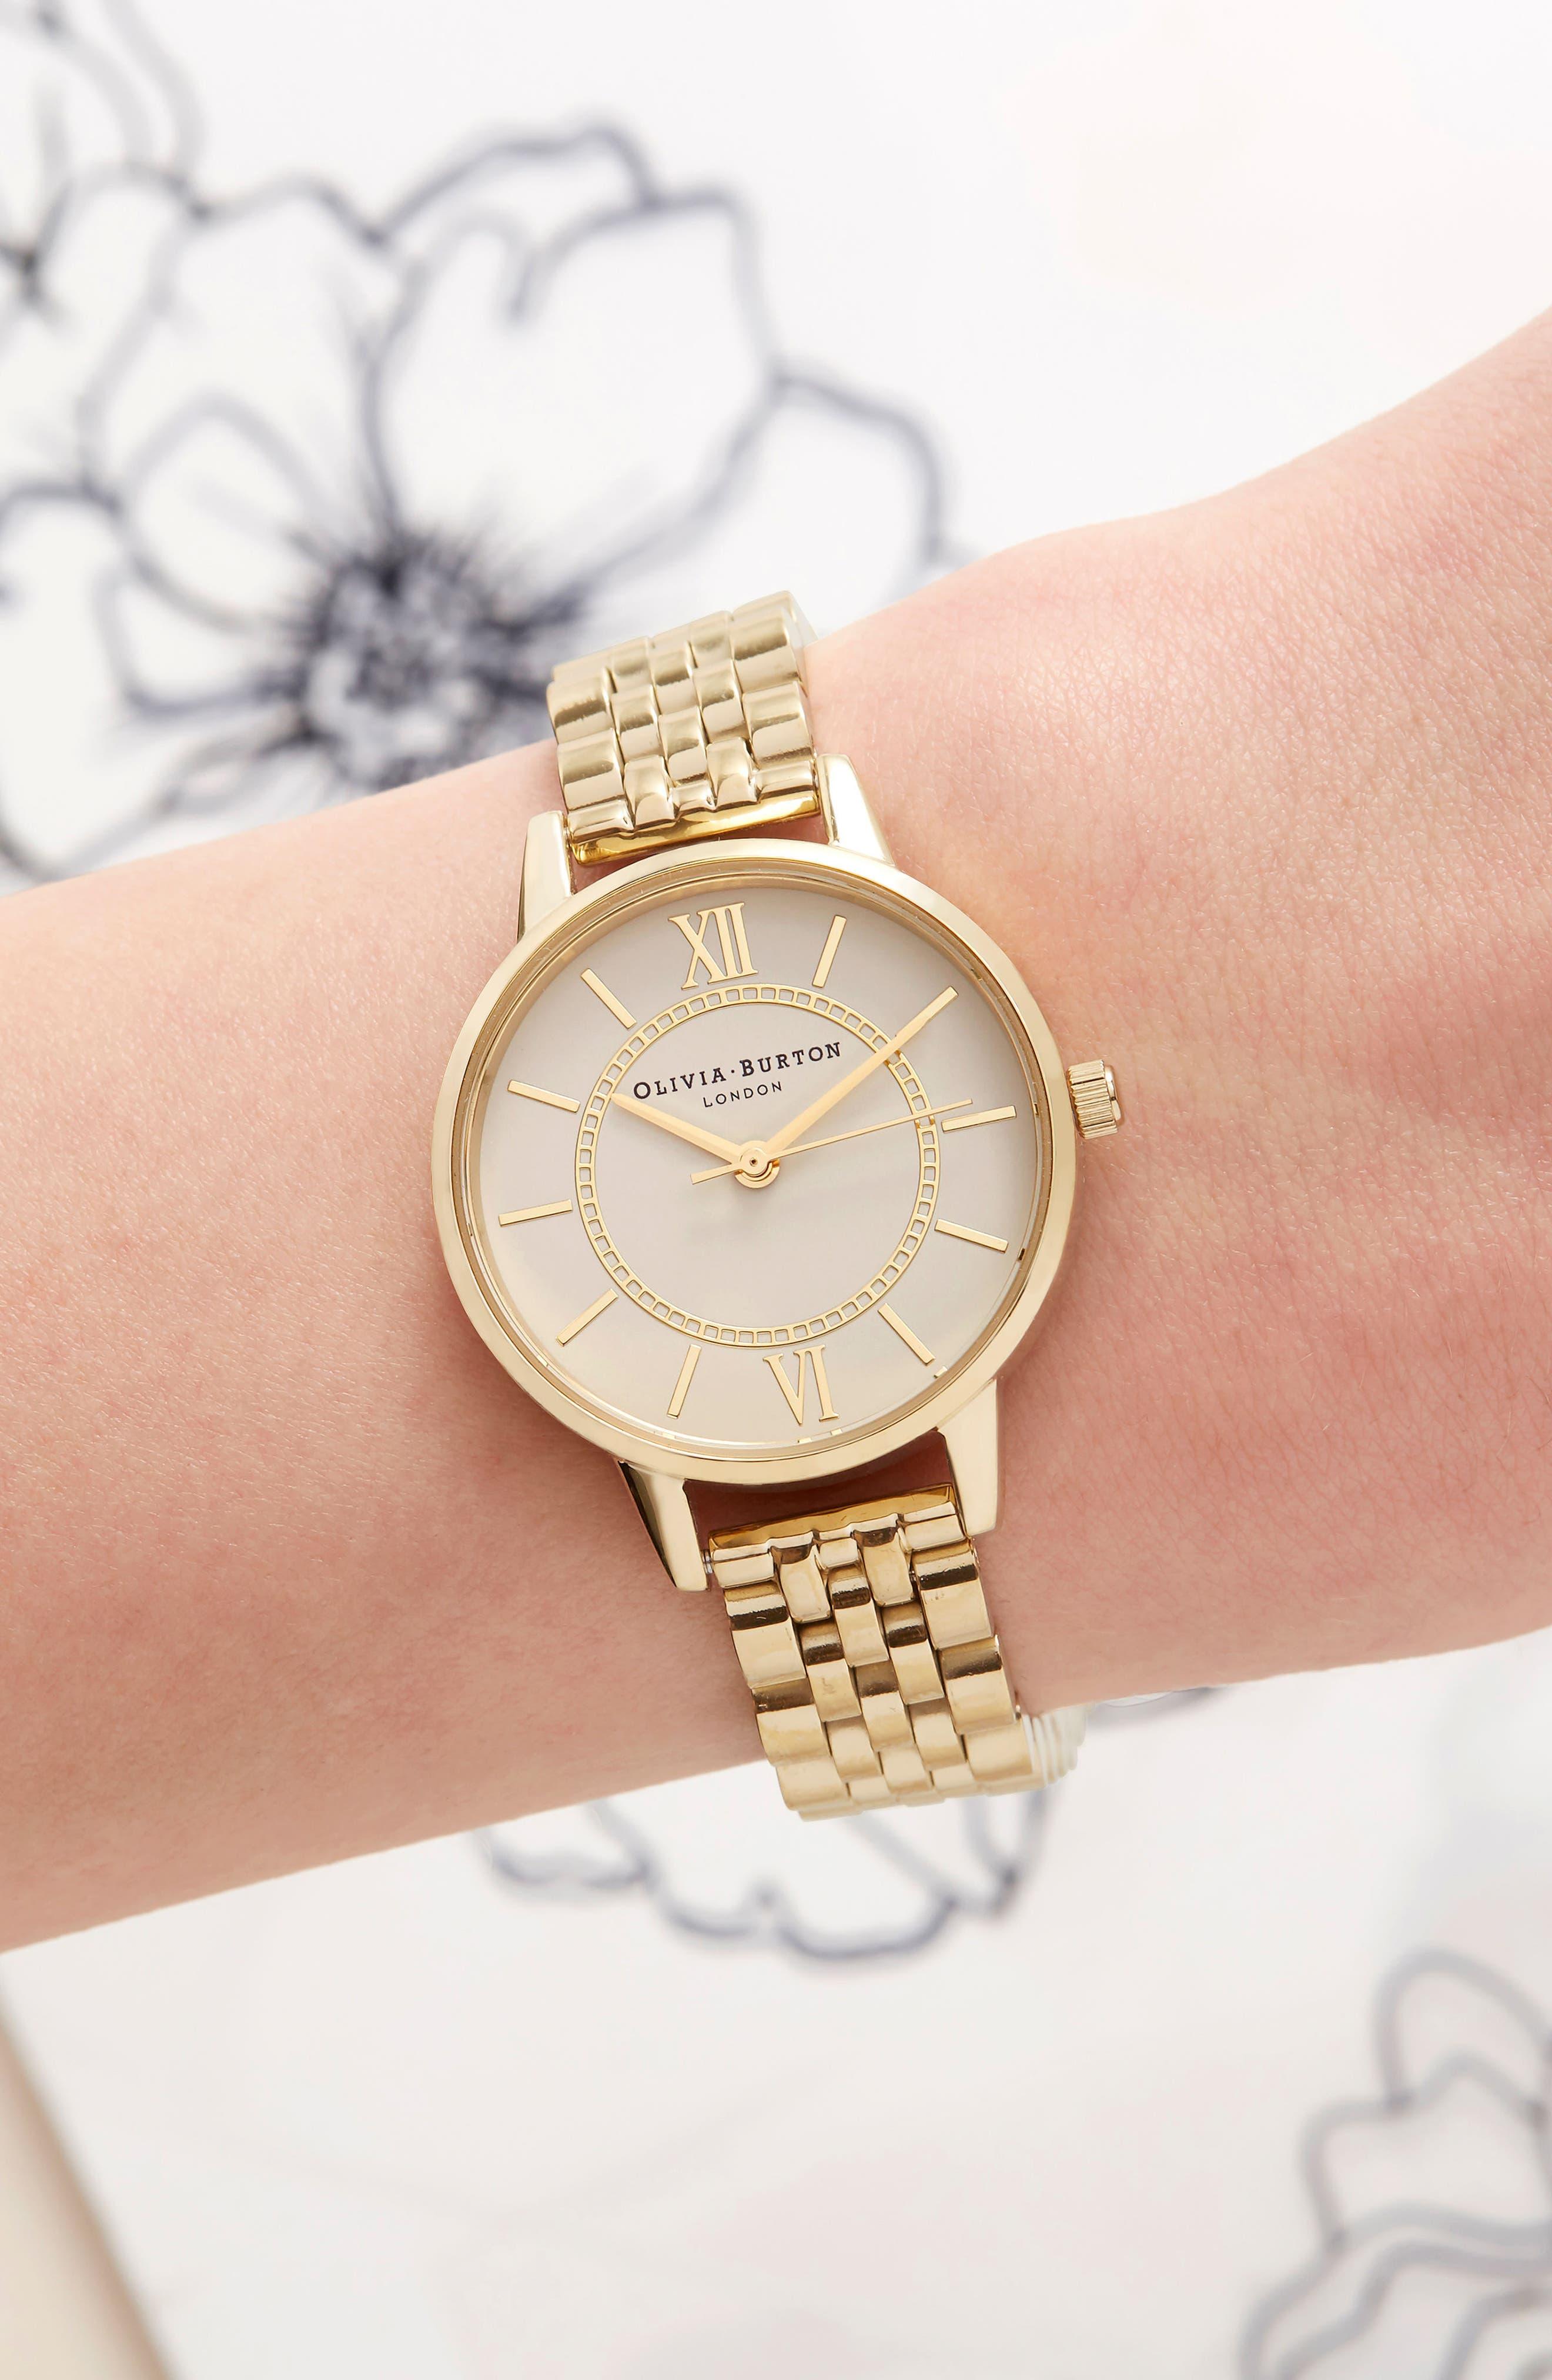 OLIVIA BURTON, Wonderland Bracelet Watch, 30mm, Alternate thumbnail 2, color, GOLD/ NUDE/ GOLD